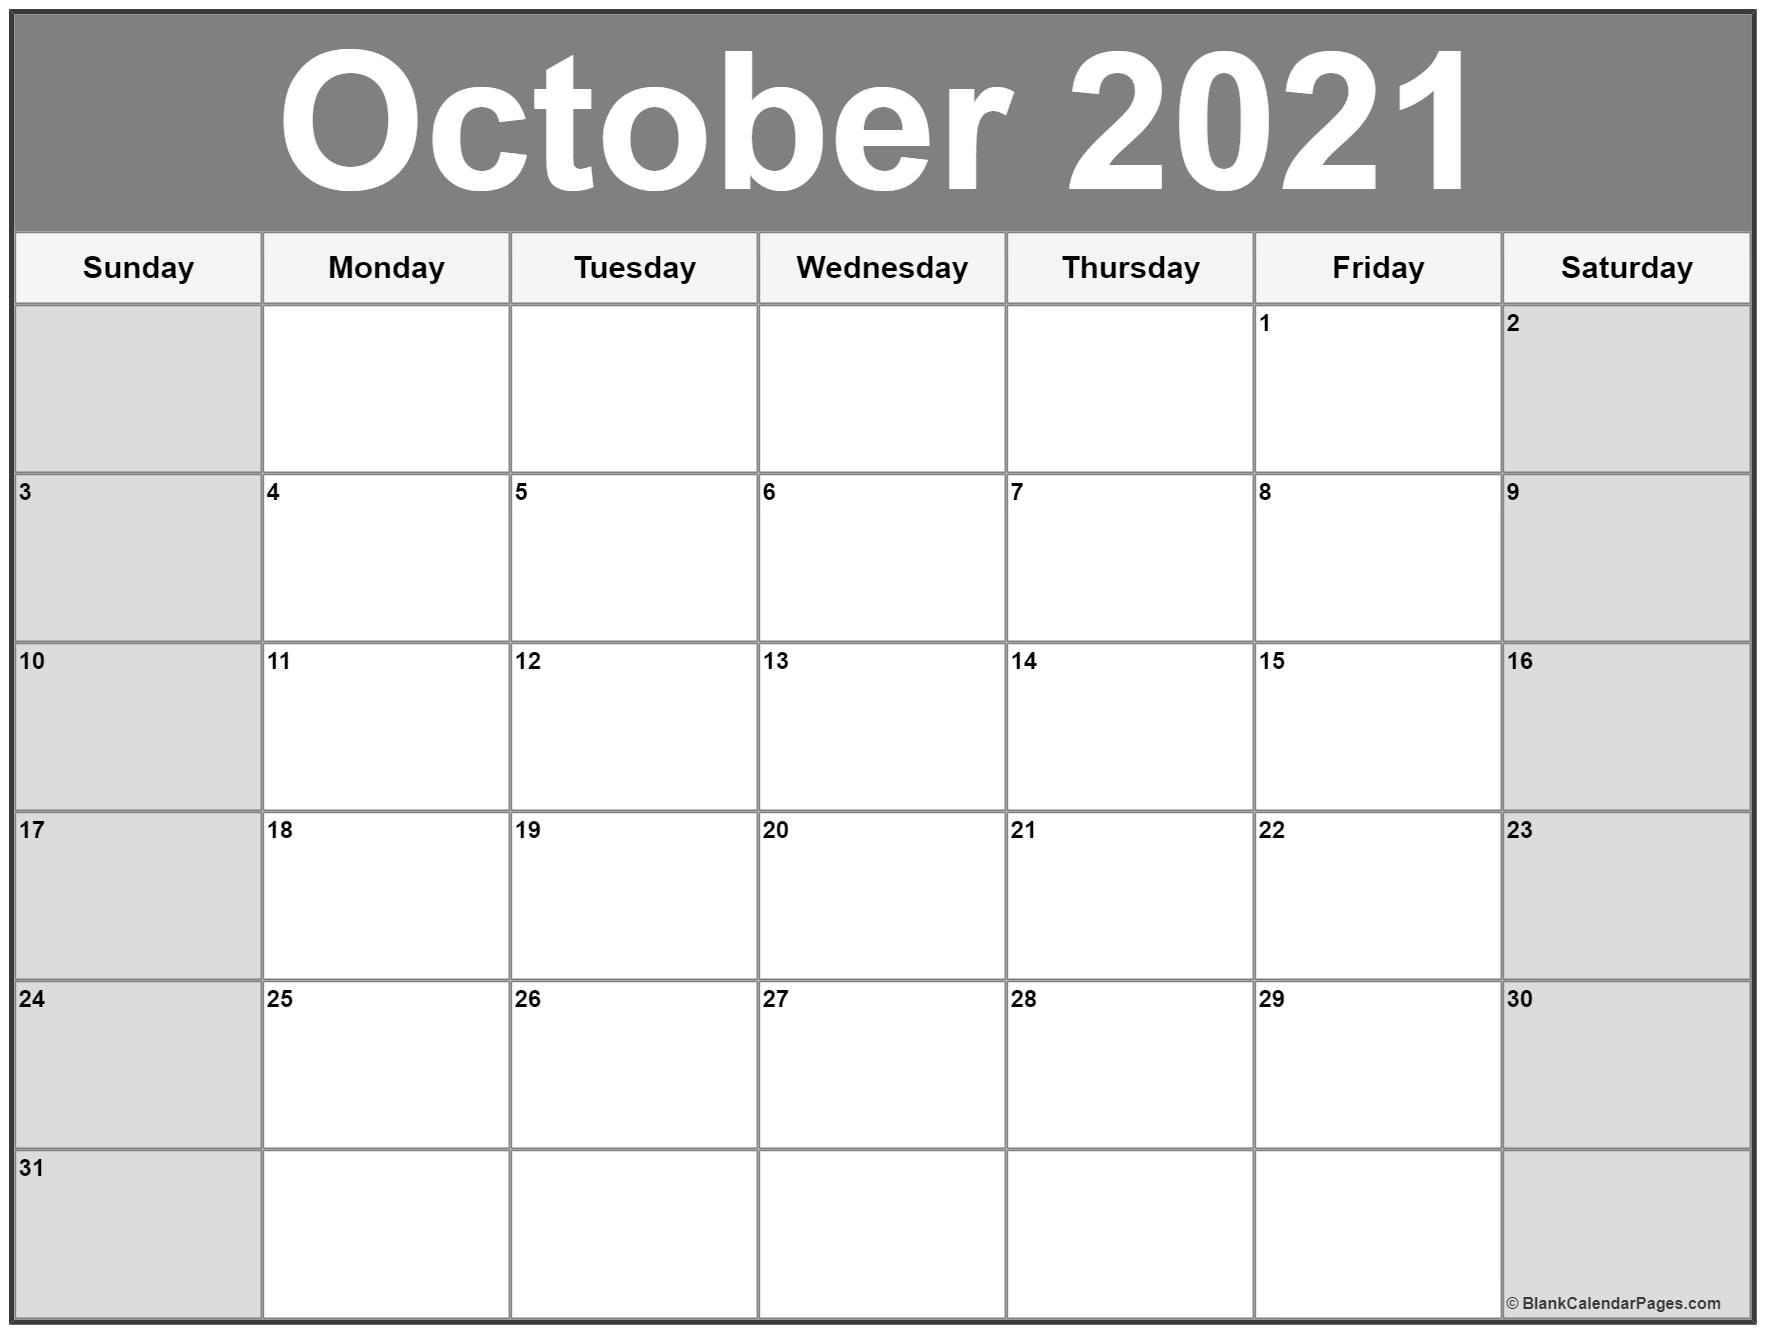 October 2021 Calendar | 56+ Templates Of 2021 Printable Calendars-2021 Printable Calendar From October Thru December